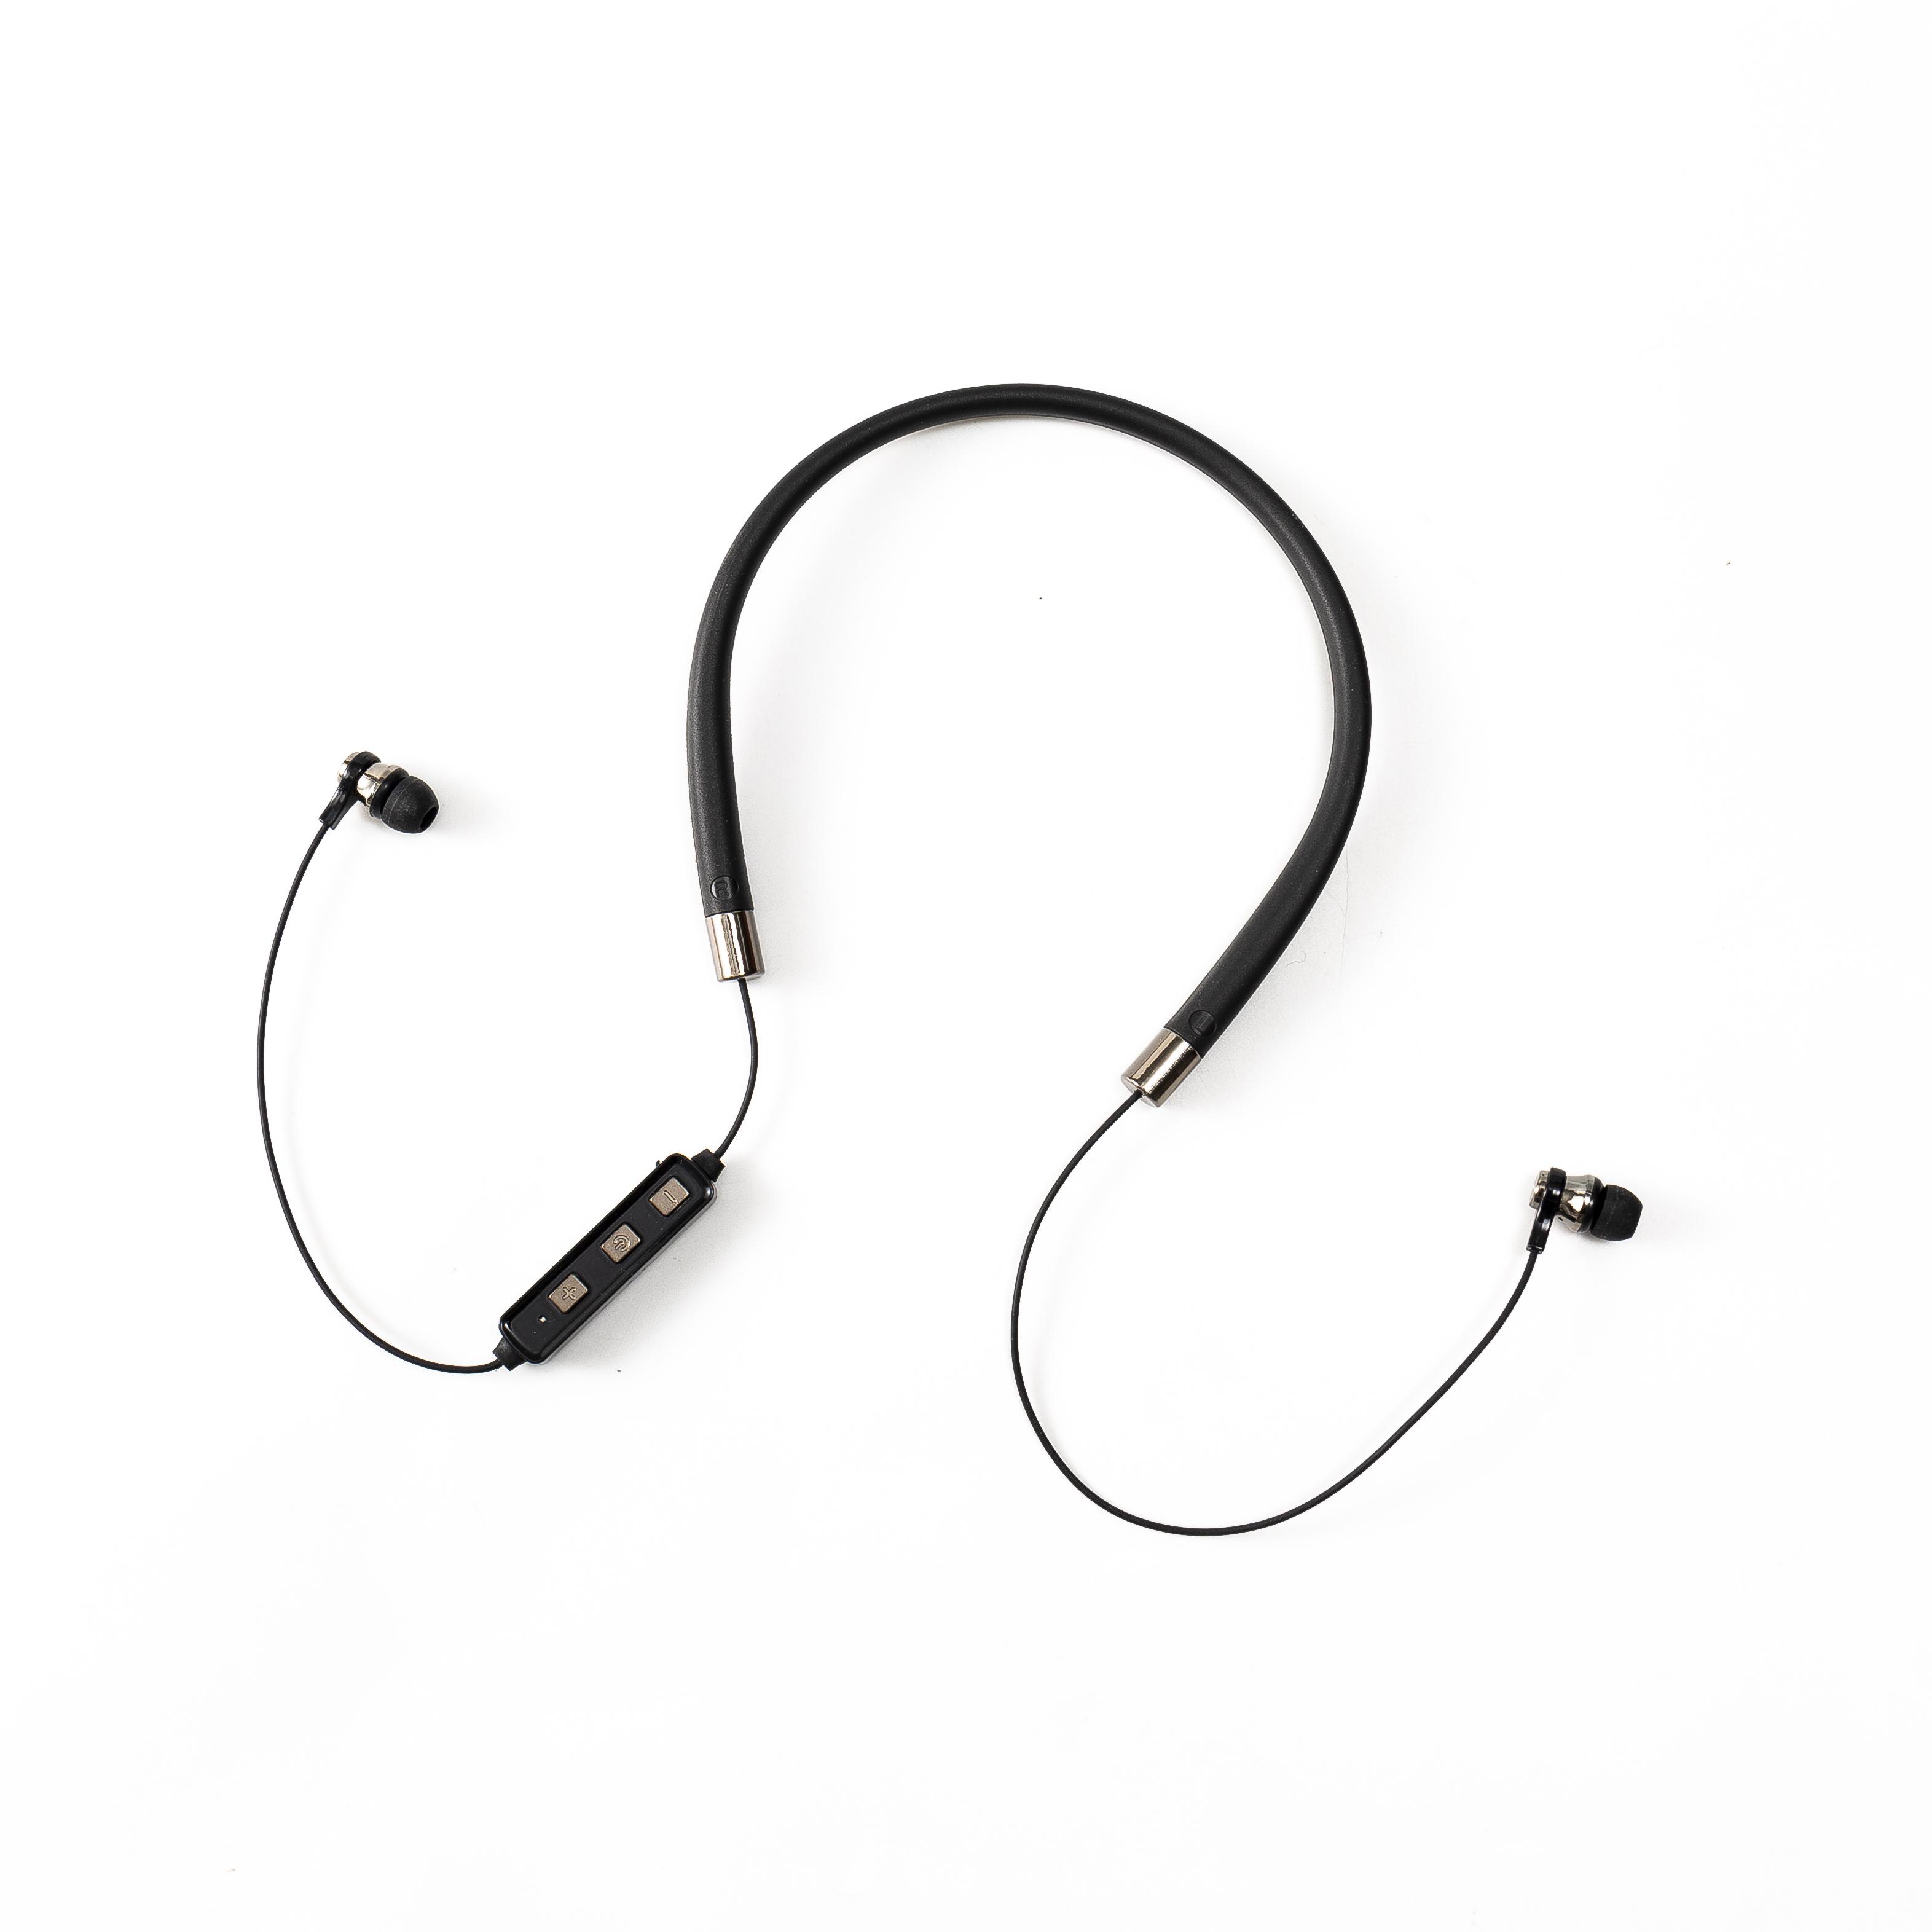 Ce/FCC/RoHS Fashion 5.0 Bluetooth Neckband in ear earphone Sports Wireless Portable music headphone Low price necklace Earphone - idealBuds Earphone | idealBuds.net